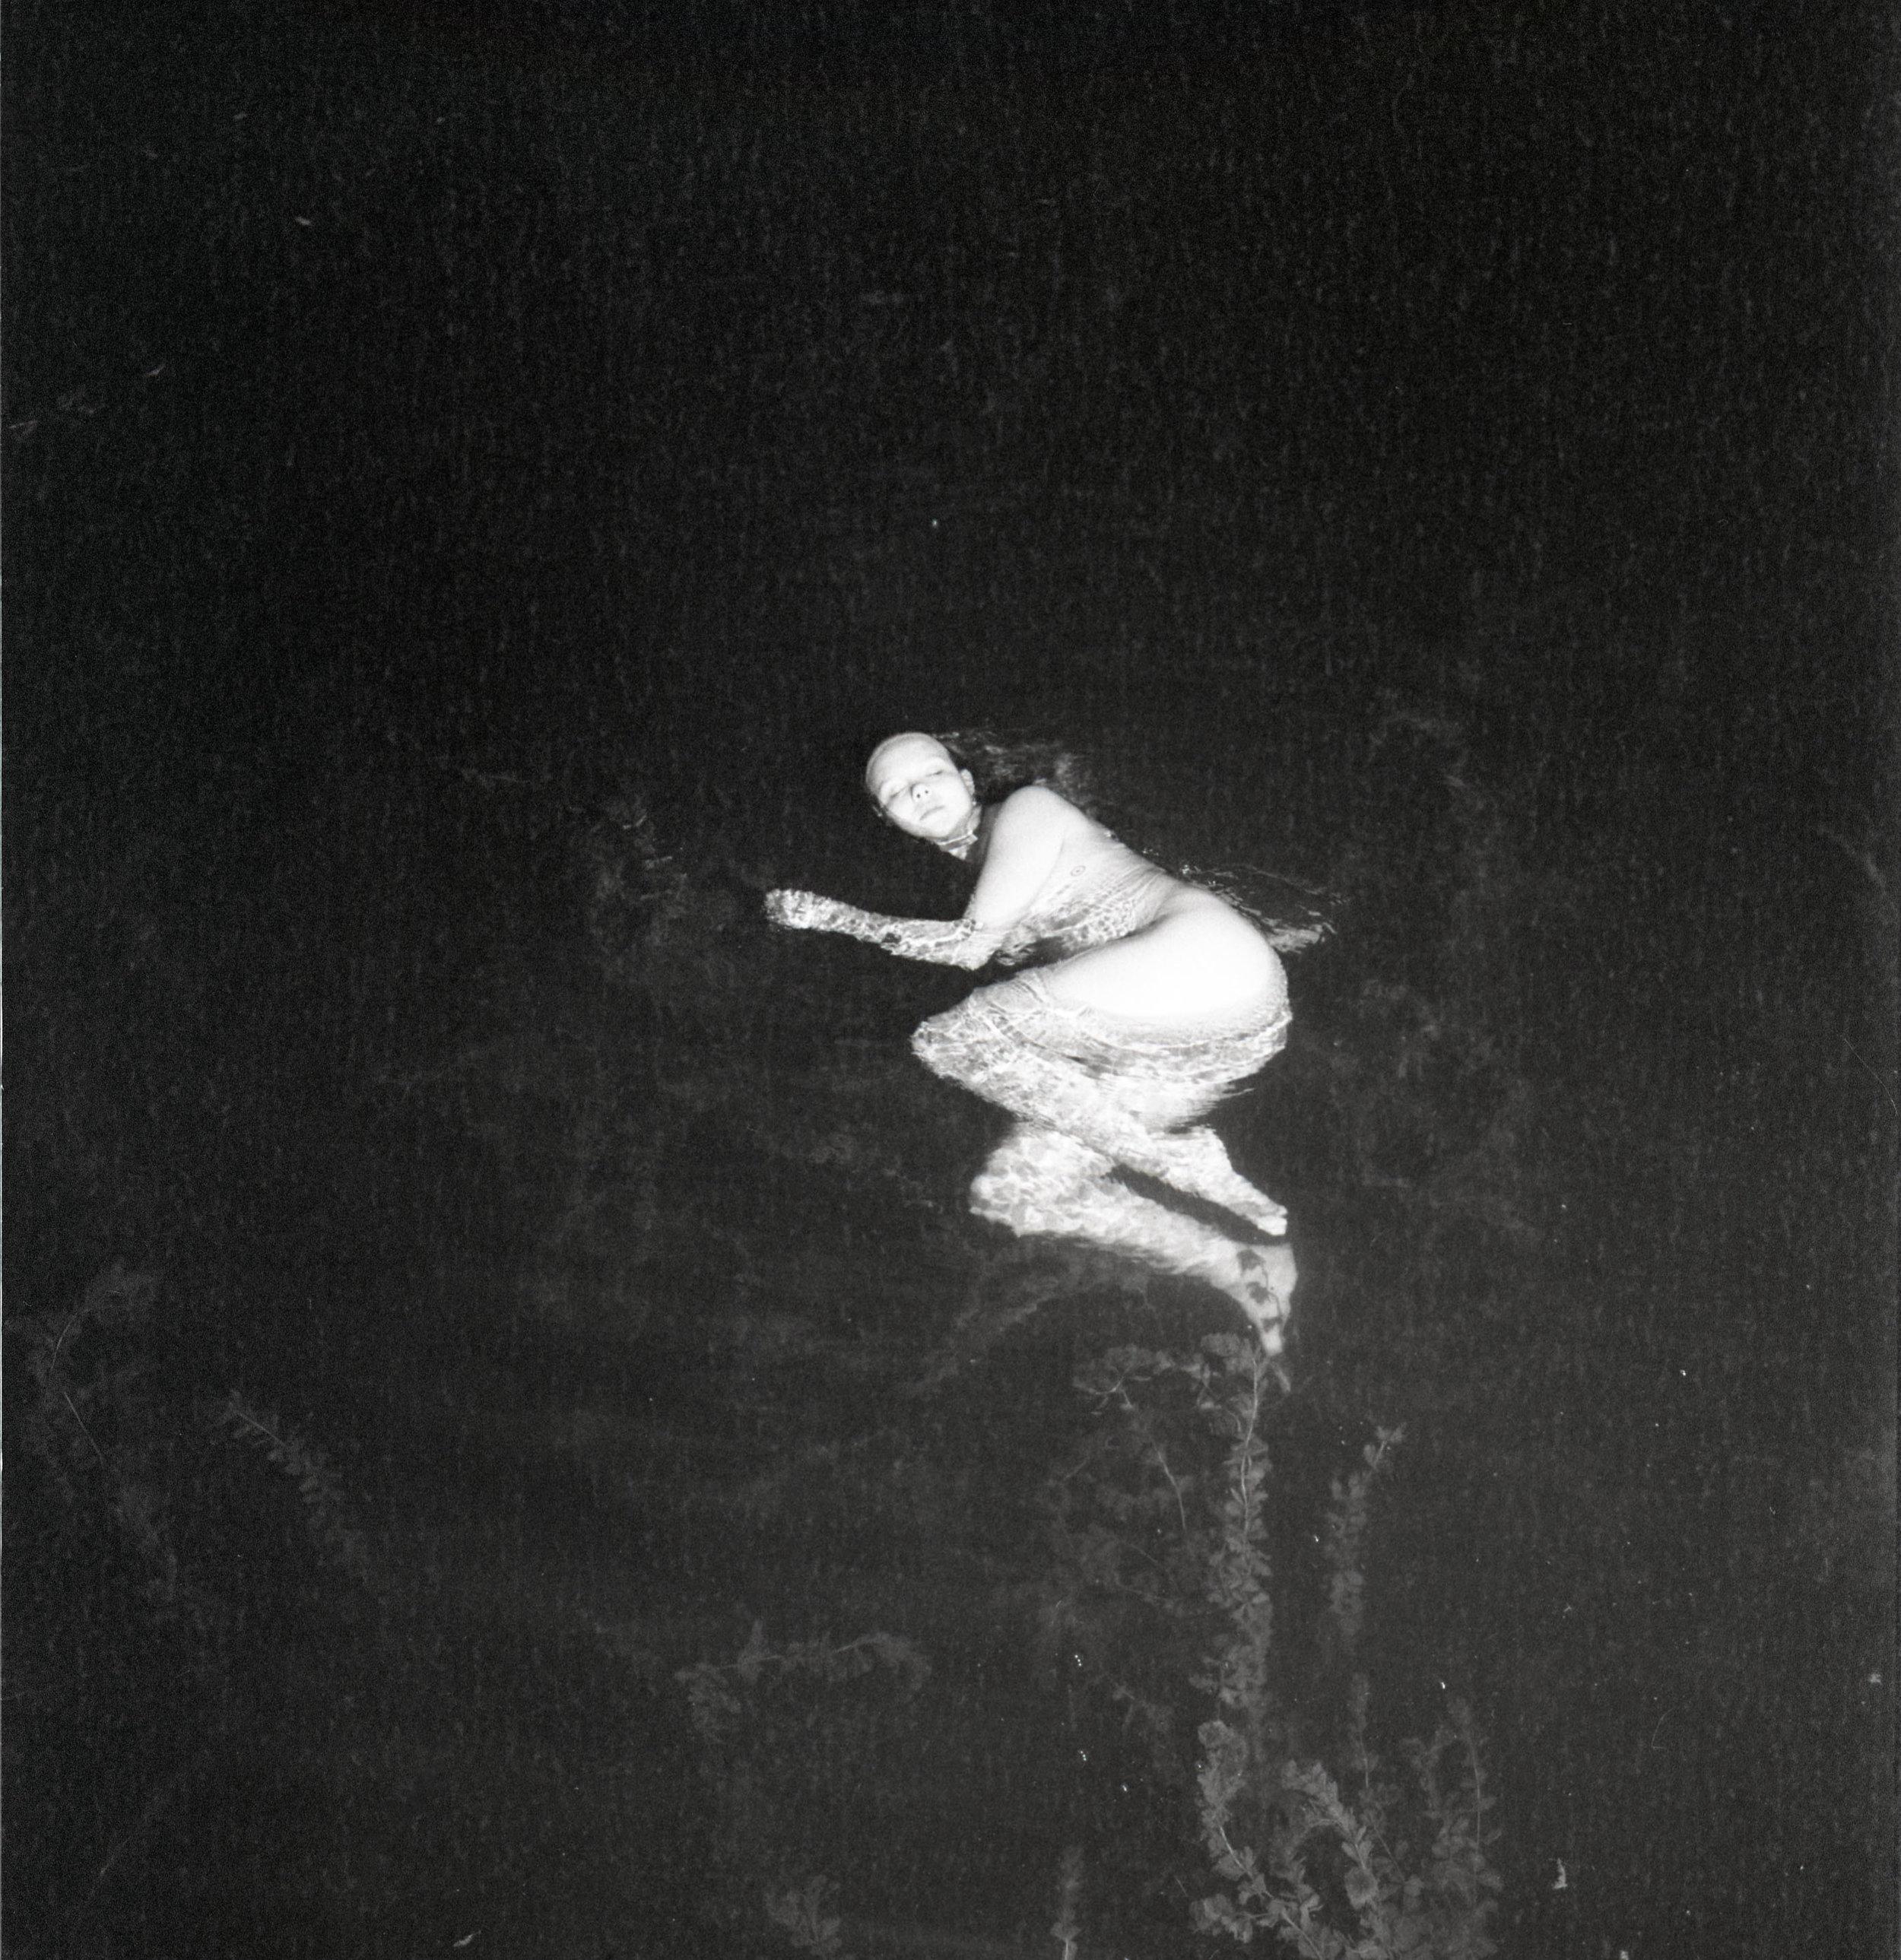 swim-7.jpg